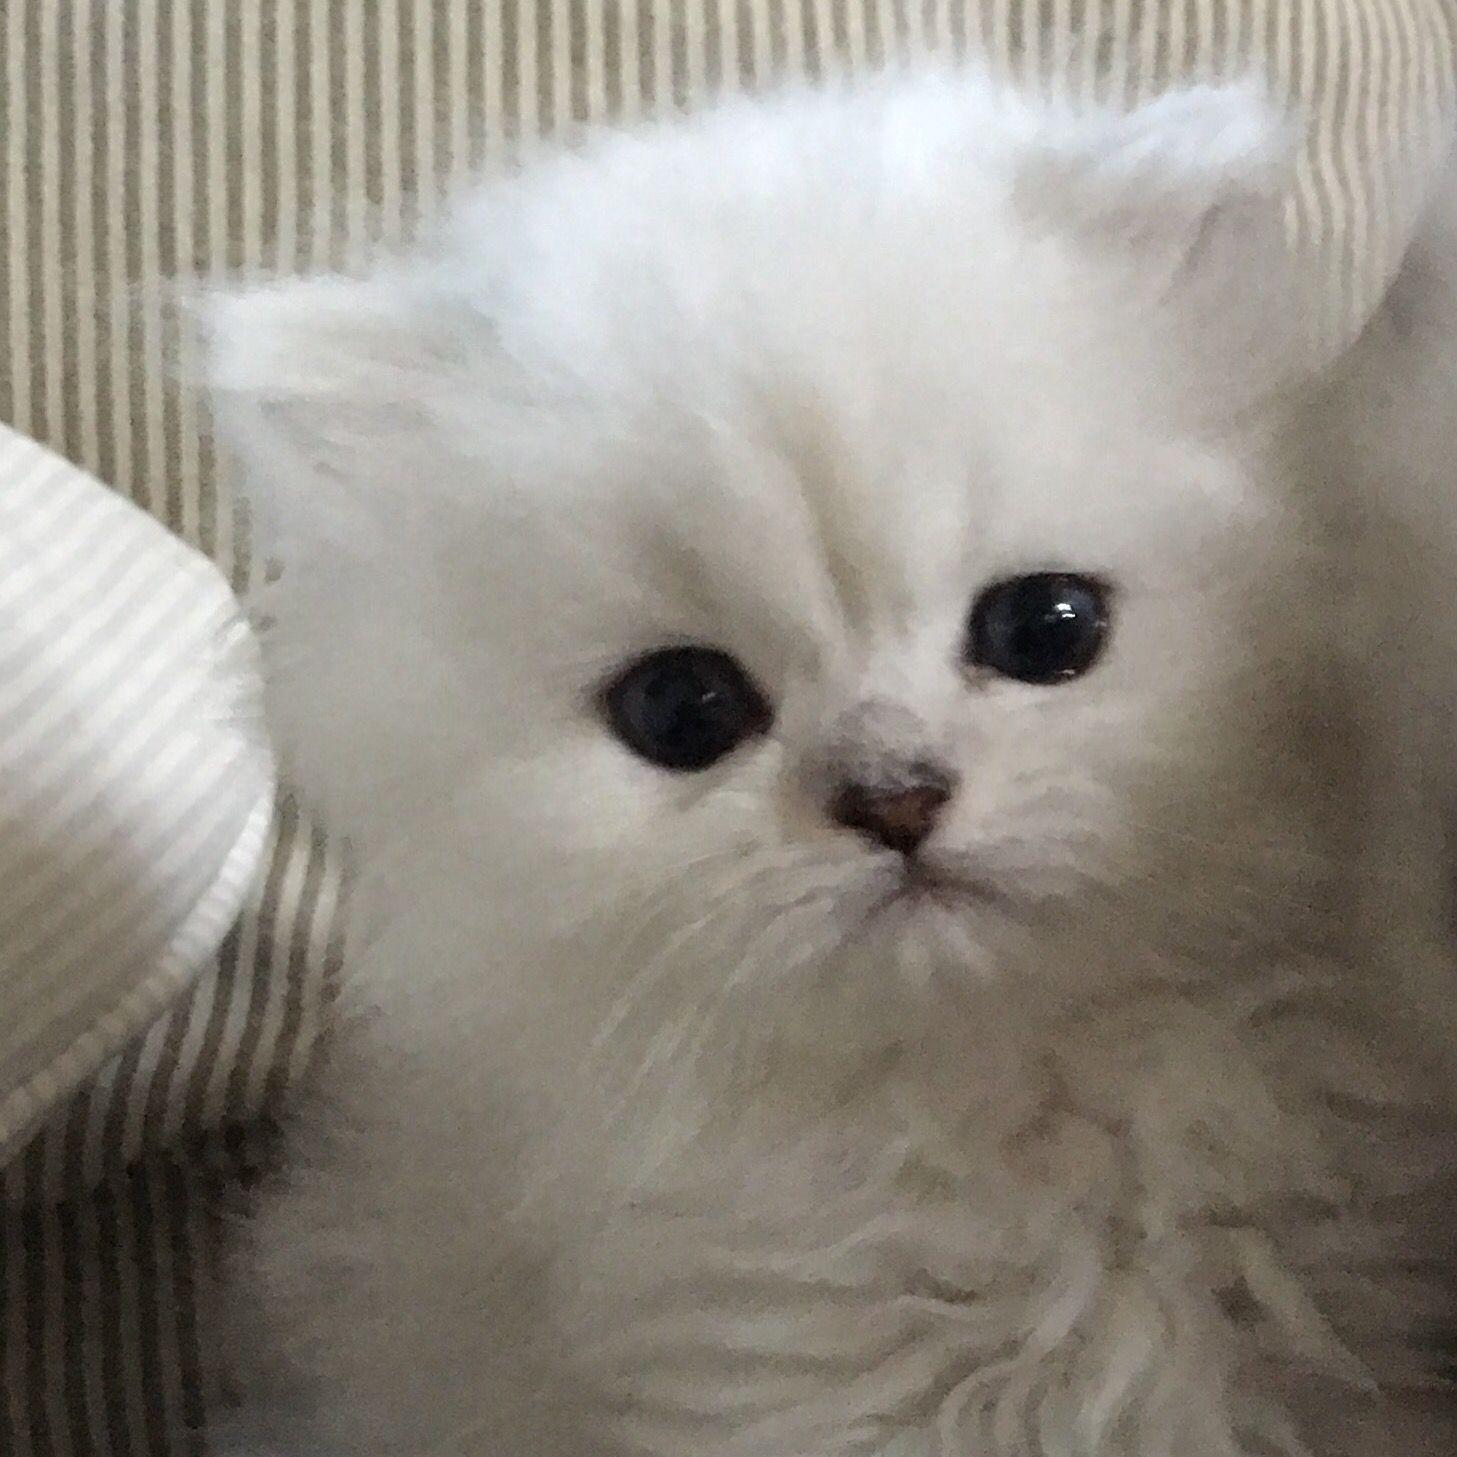 Pin by Powderpuff Persians on PowderpuffPersians com | Teacup kitten